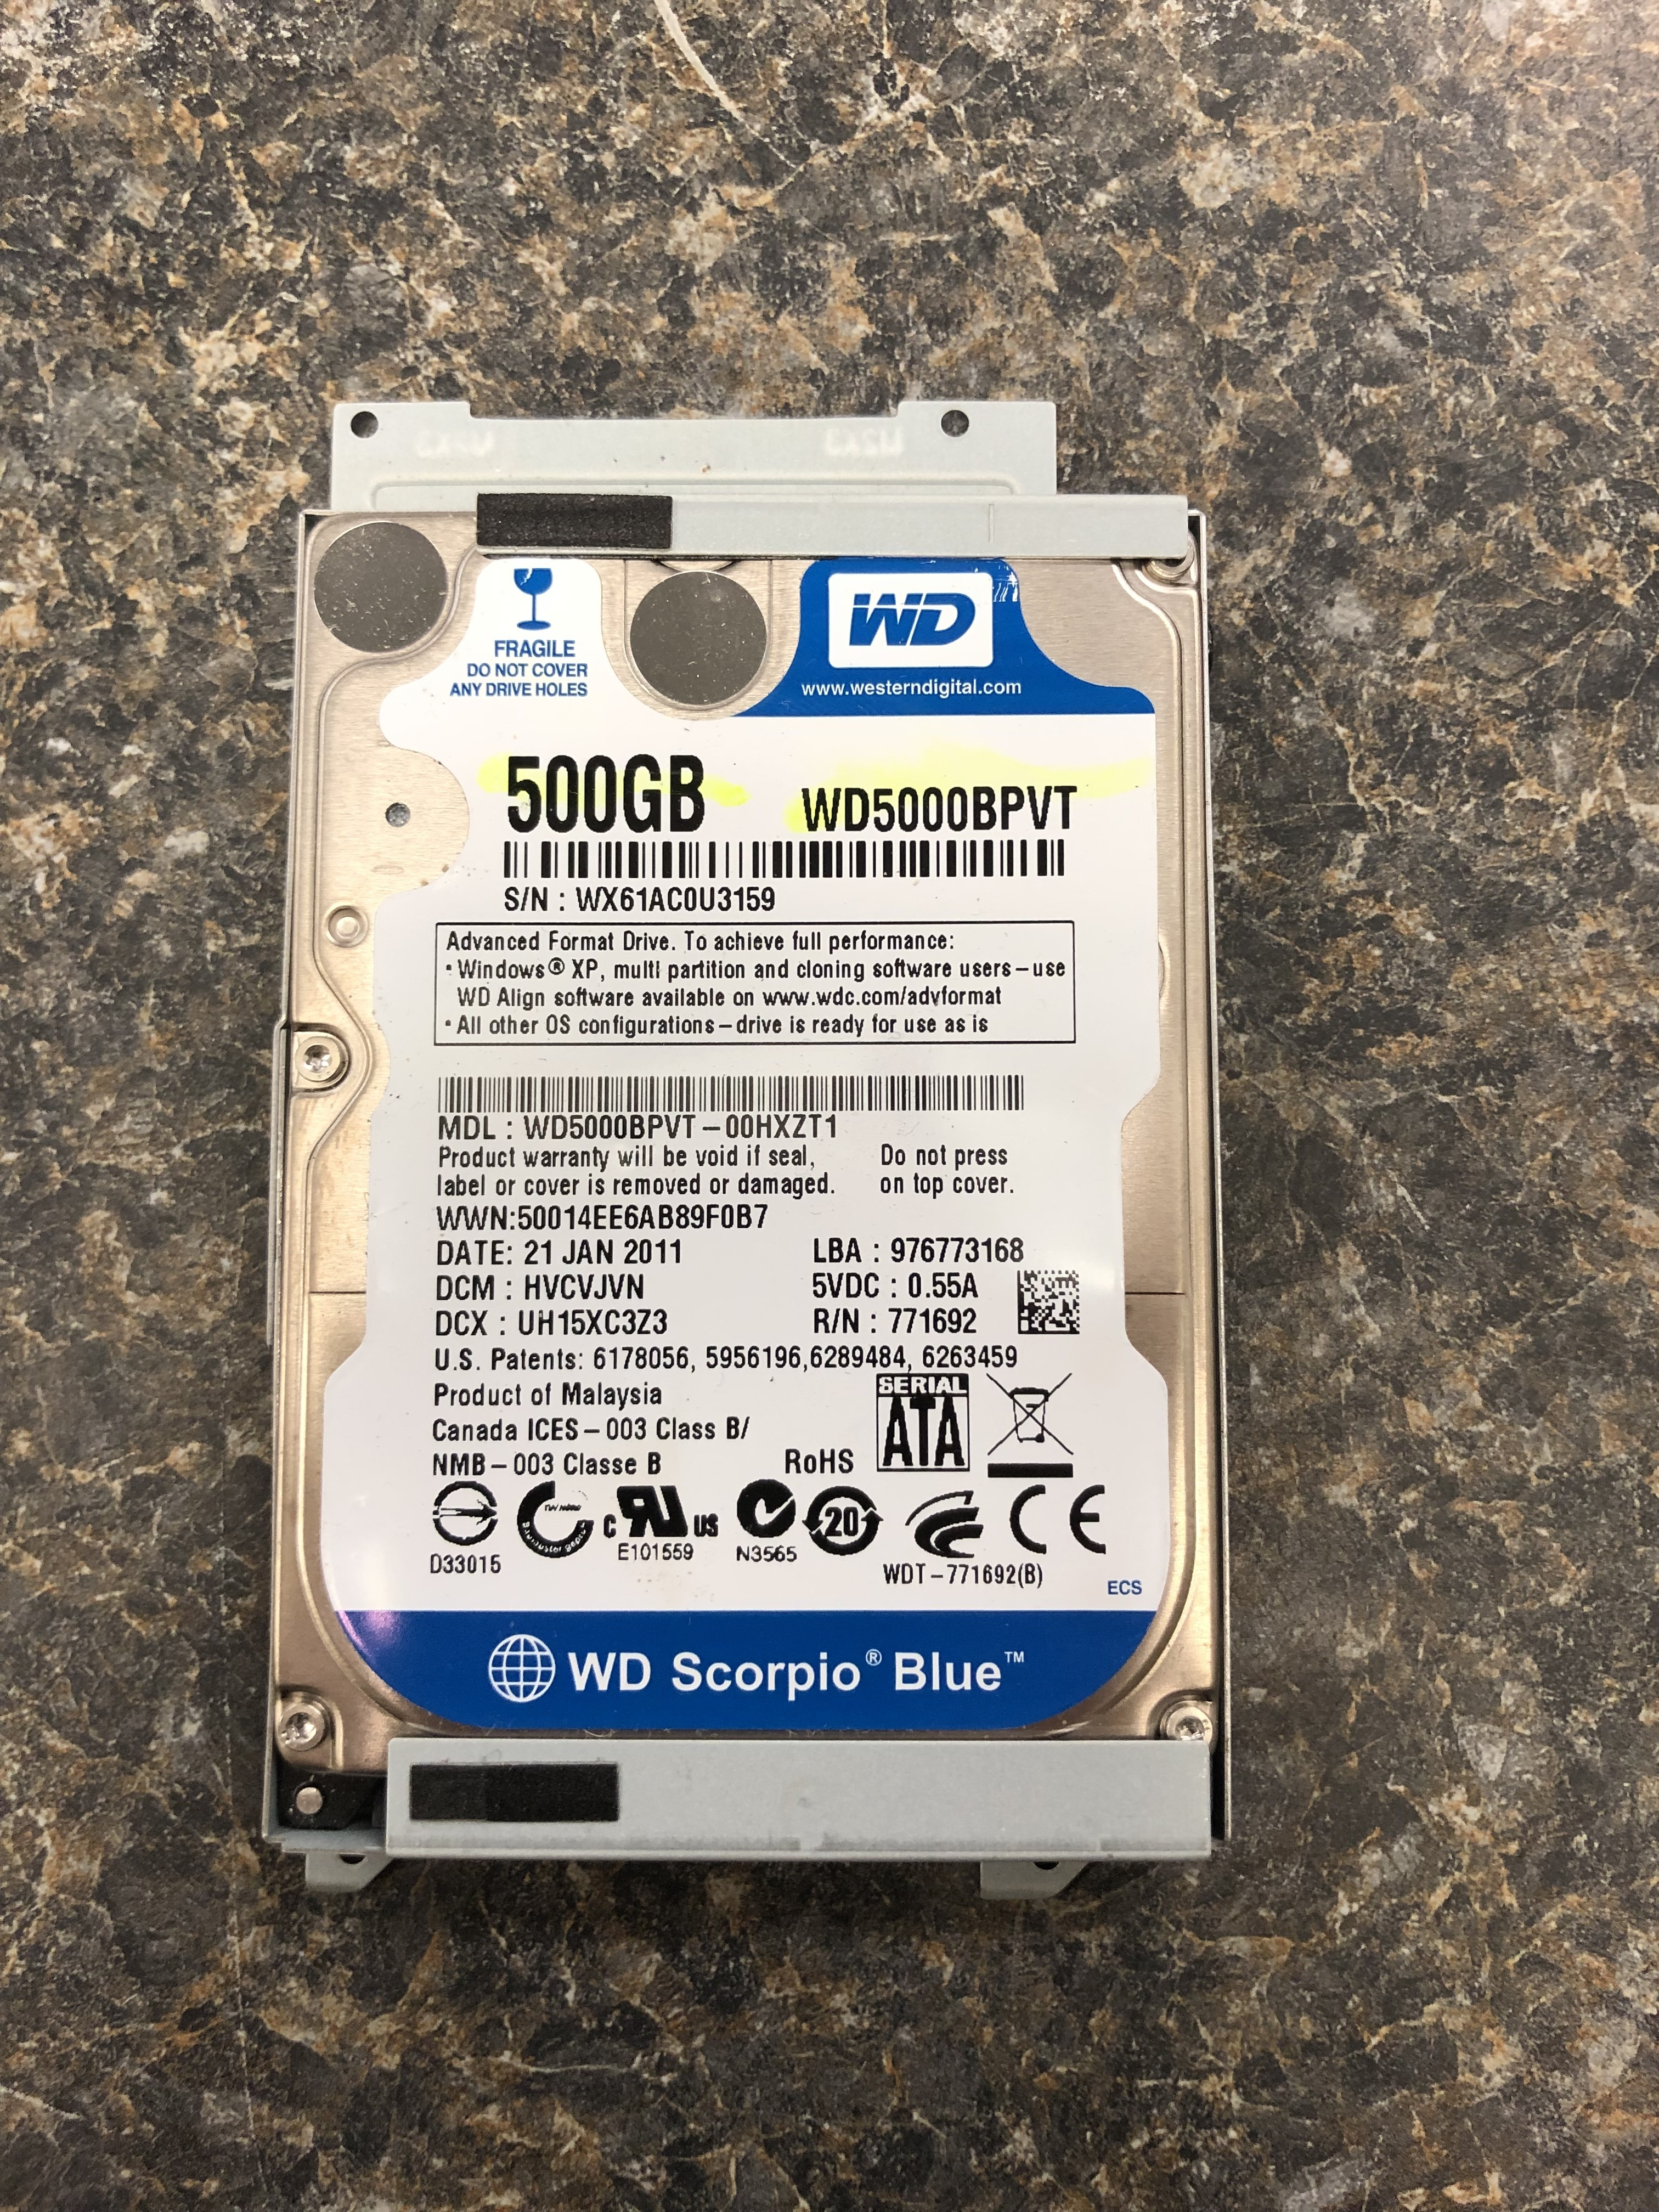 WESTERN DIGITAL - WD5000BPVT - COMPUTER HARDWARE ELECTRONICS